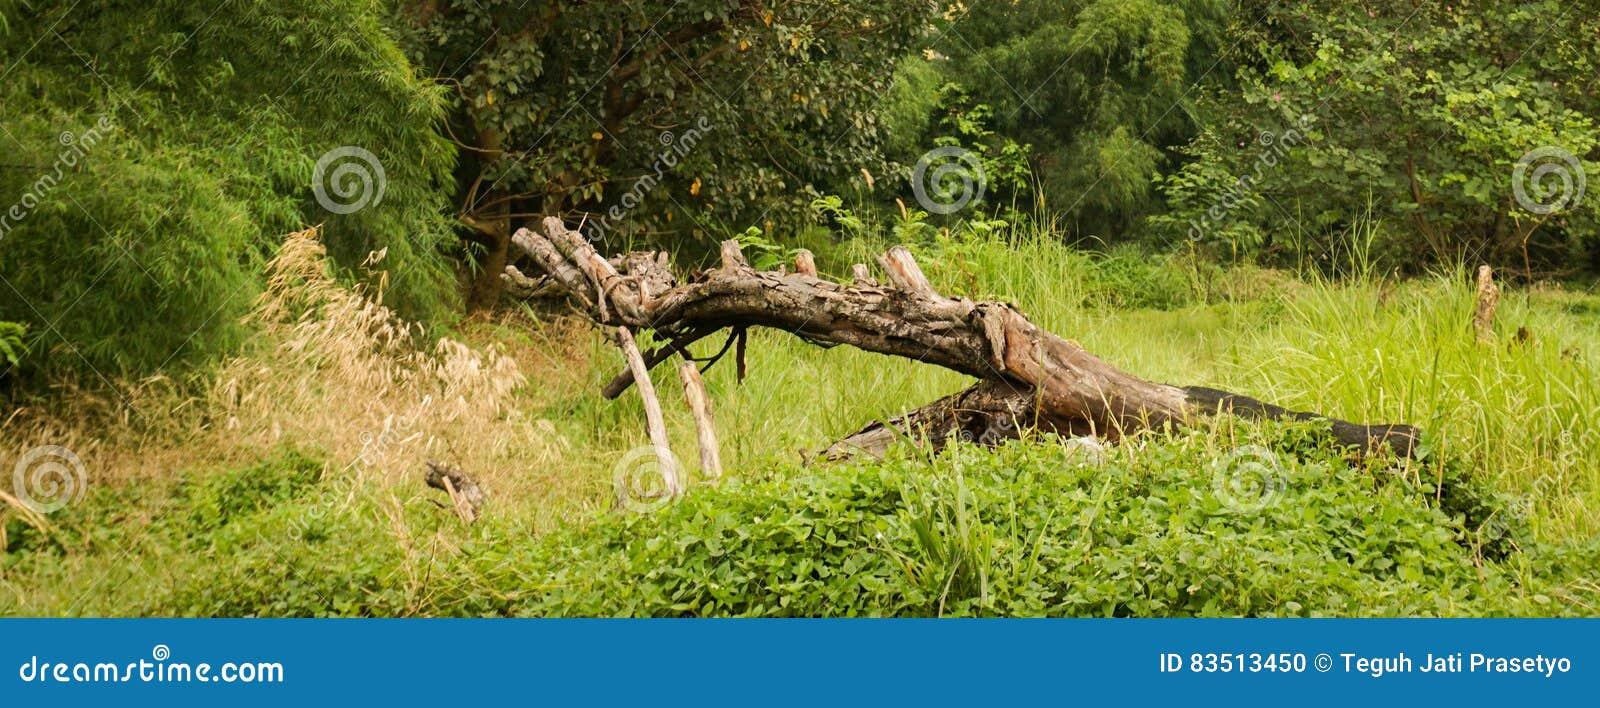 gefallener toter baum mitten in grassyard foto. Black Bedroom Furniture Sets. Home Design Ideas